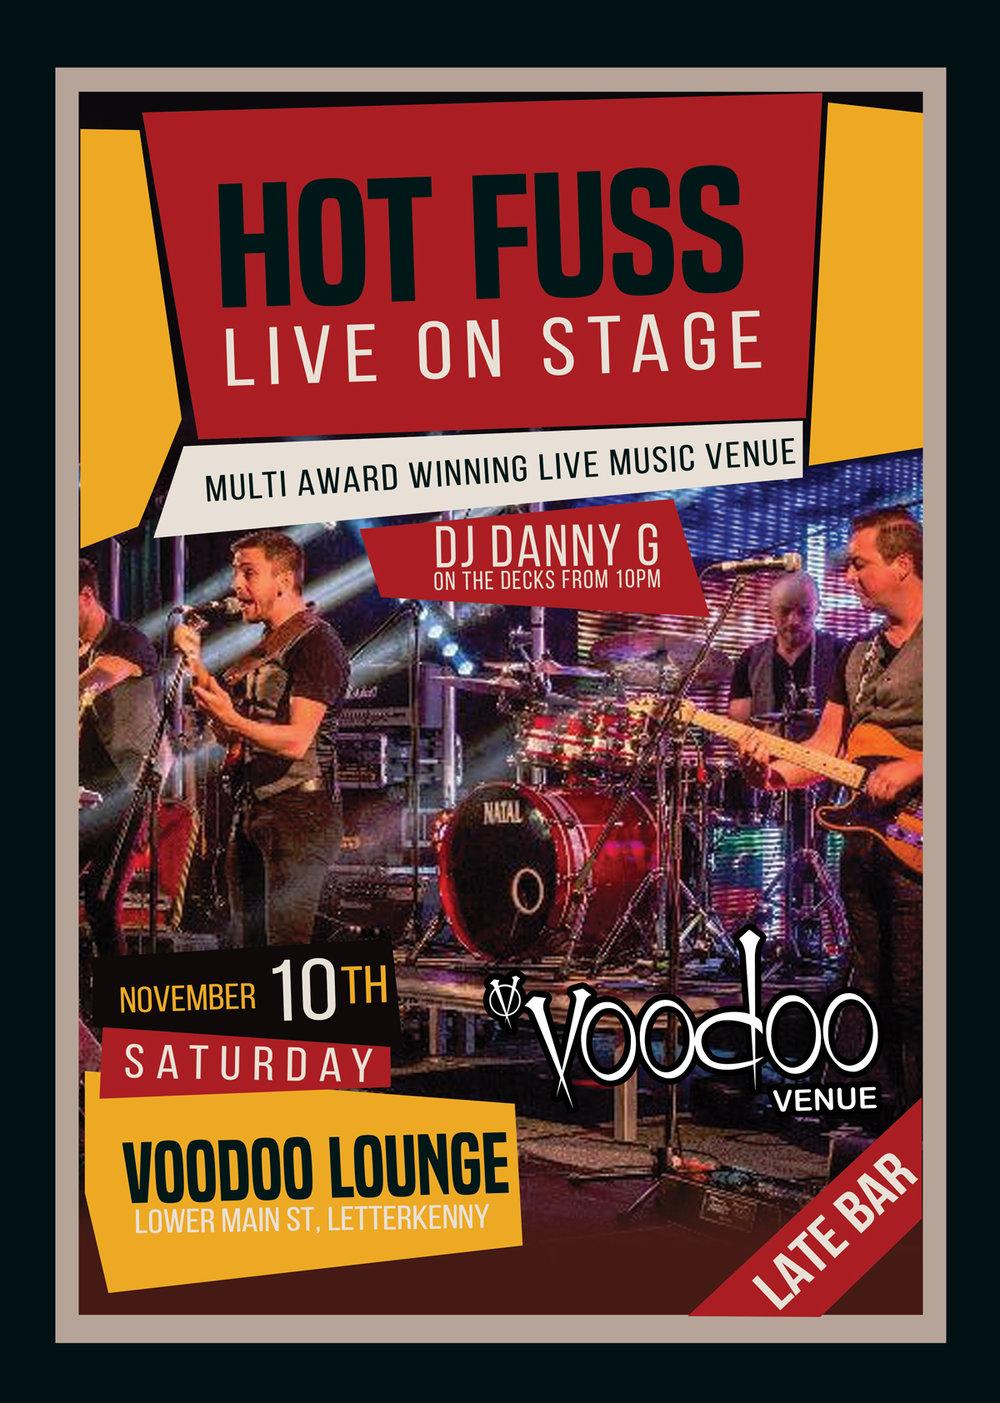 VOODOO-VENUE---hot-fuss-sat-nov-10-2018.jpg